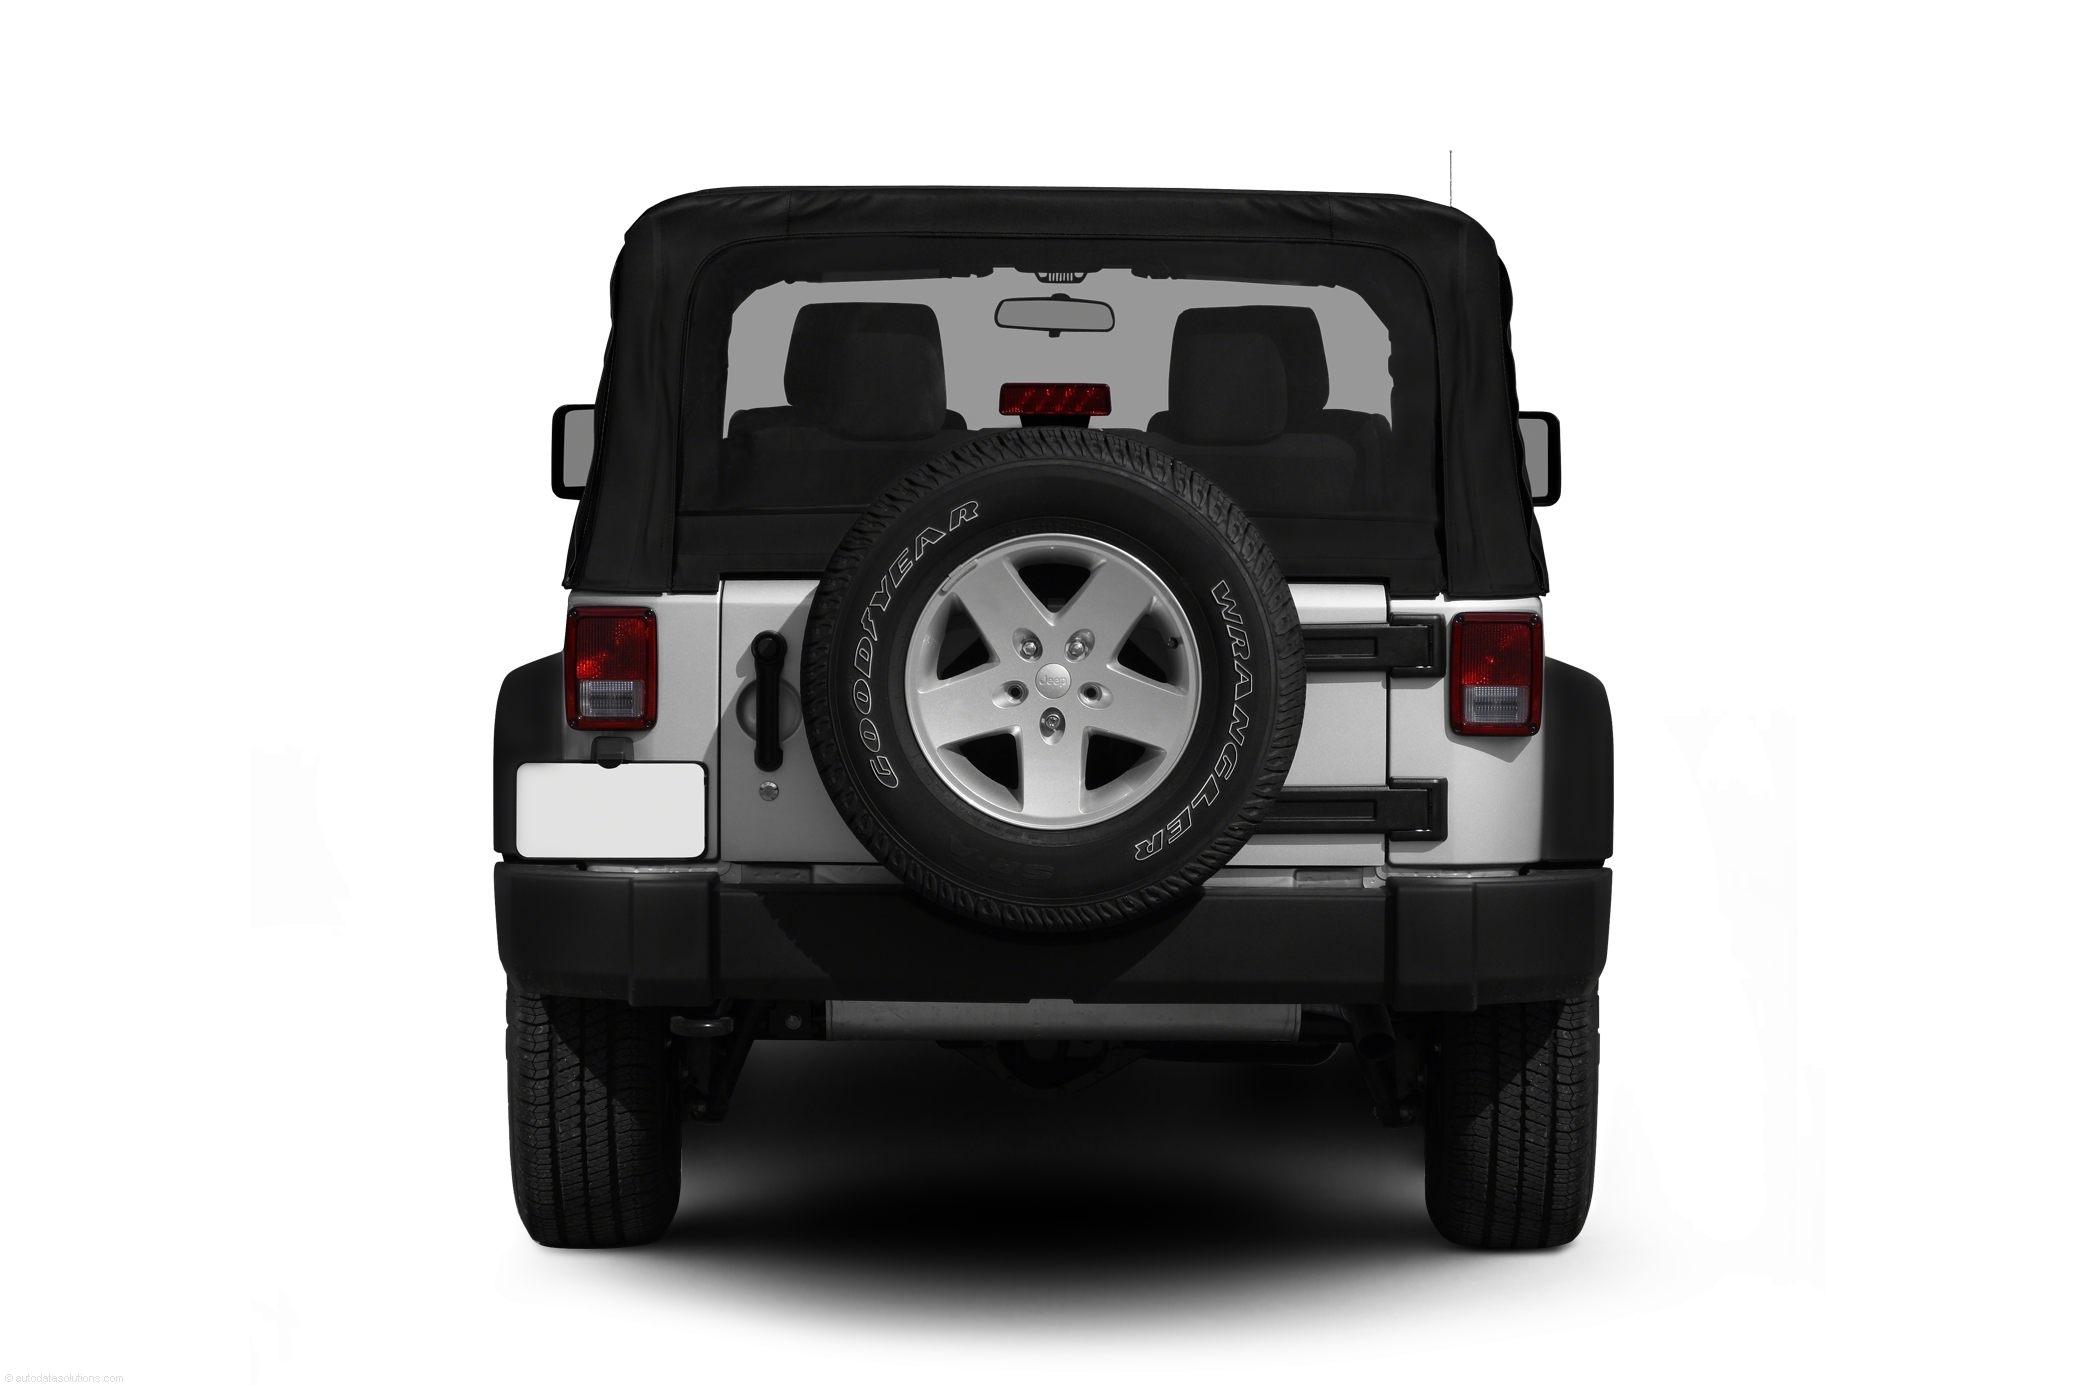 jeep wrangler invoice price 2014 invoice template free 2016 jeep invoice pricing